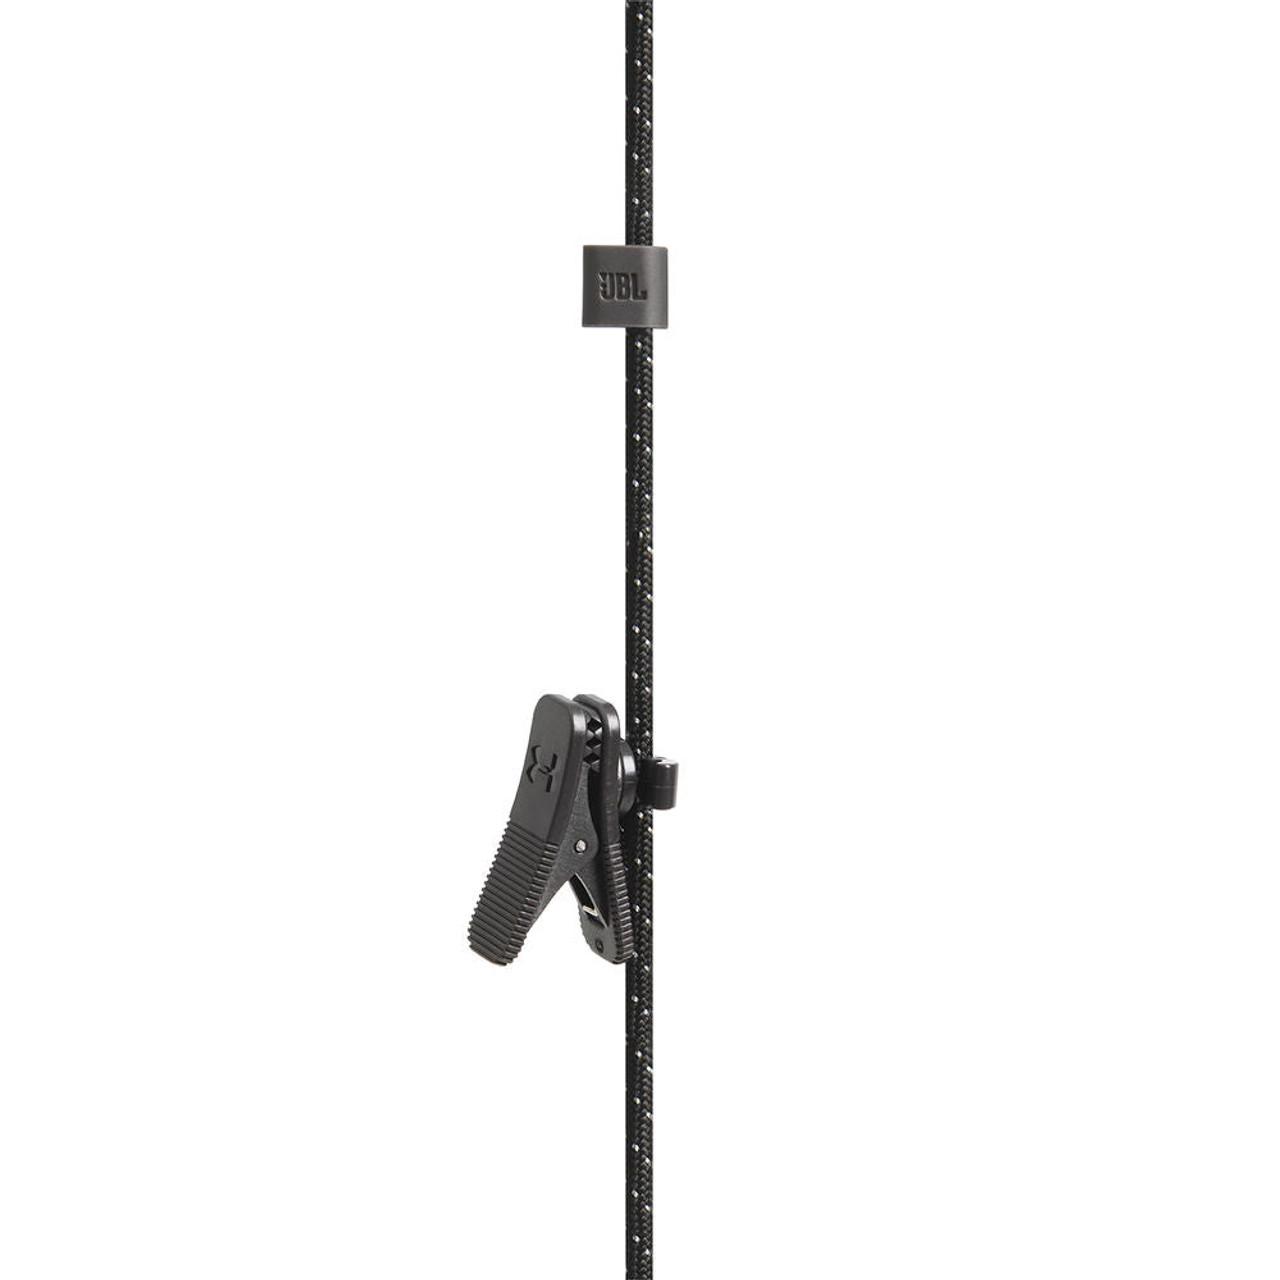 JBL UAJBLPIVOTBLKAM-Z Under Armor PIVOT Wireless in-ear Headphones, Black - Certified Refurbished